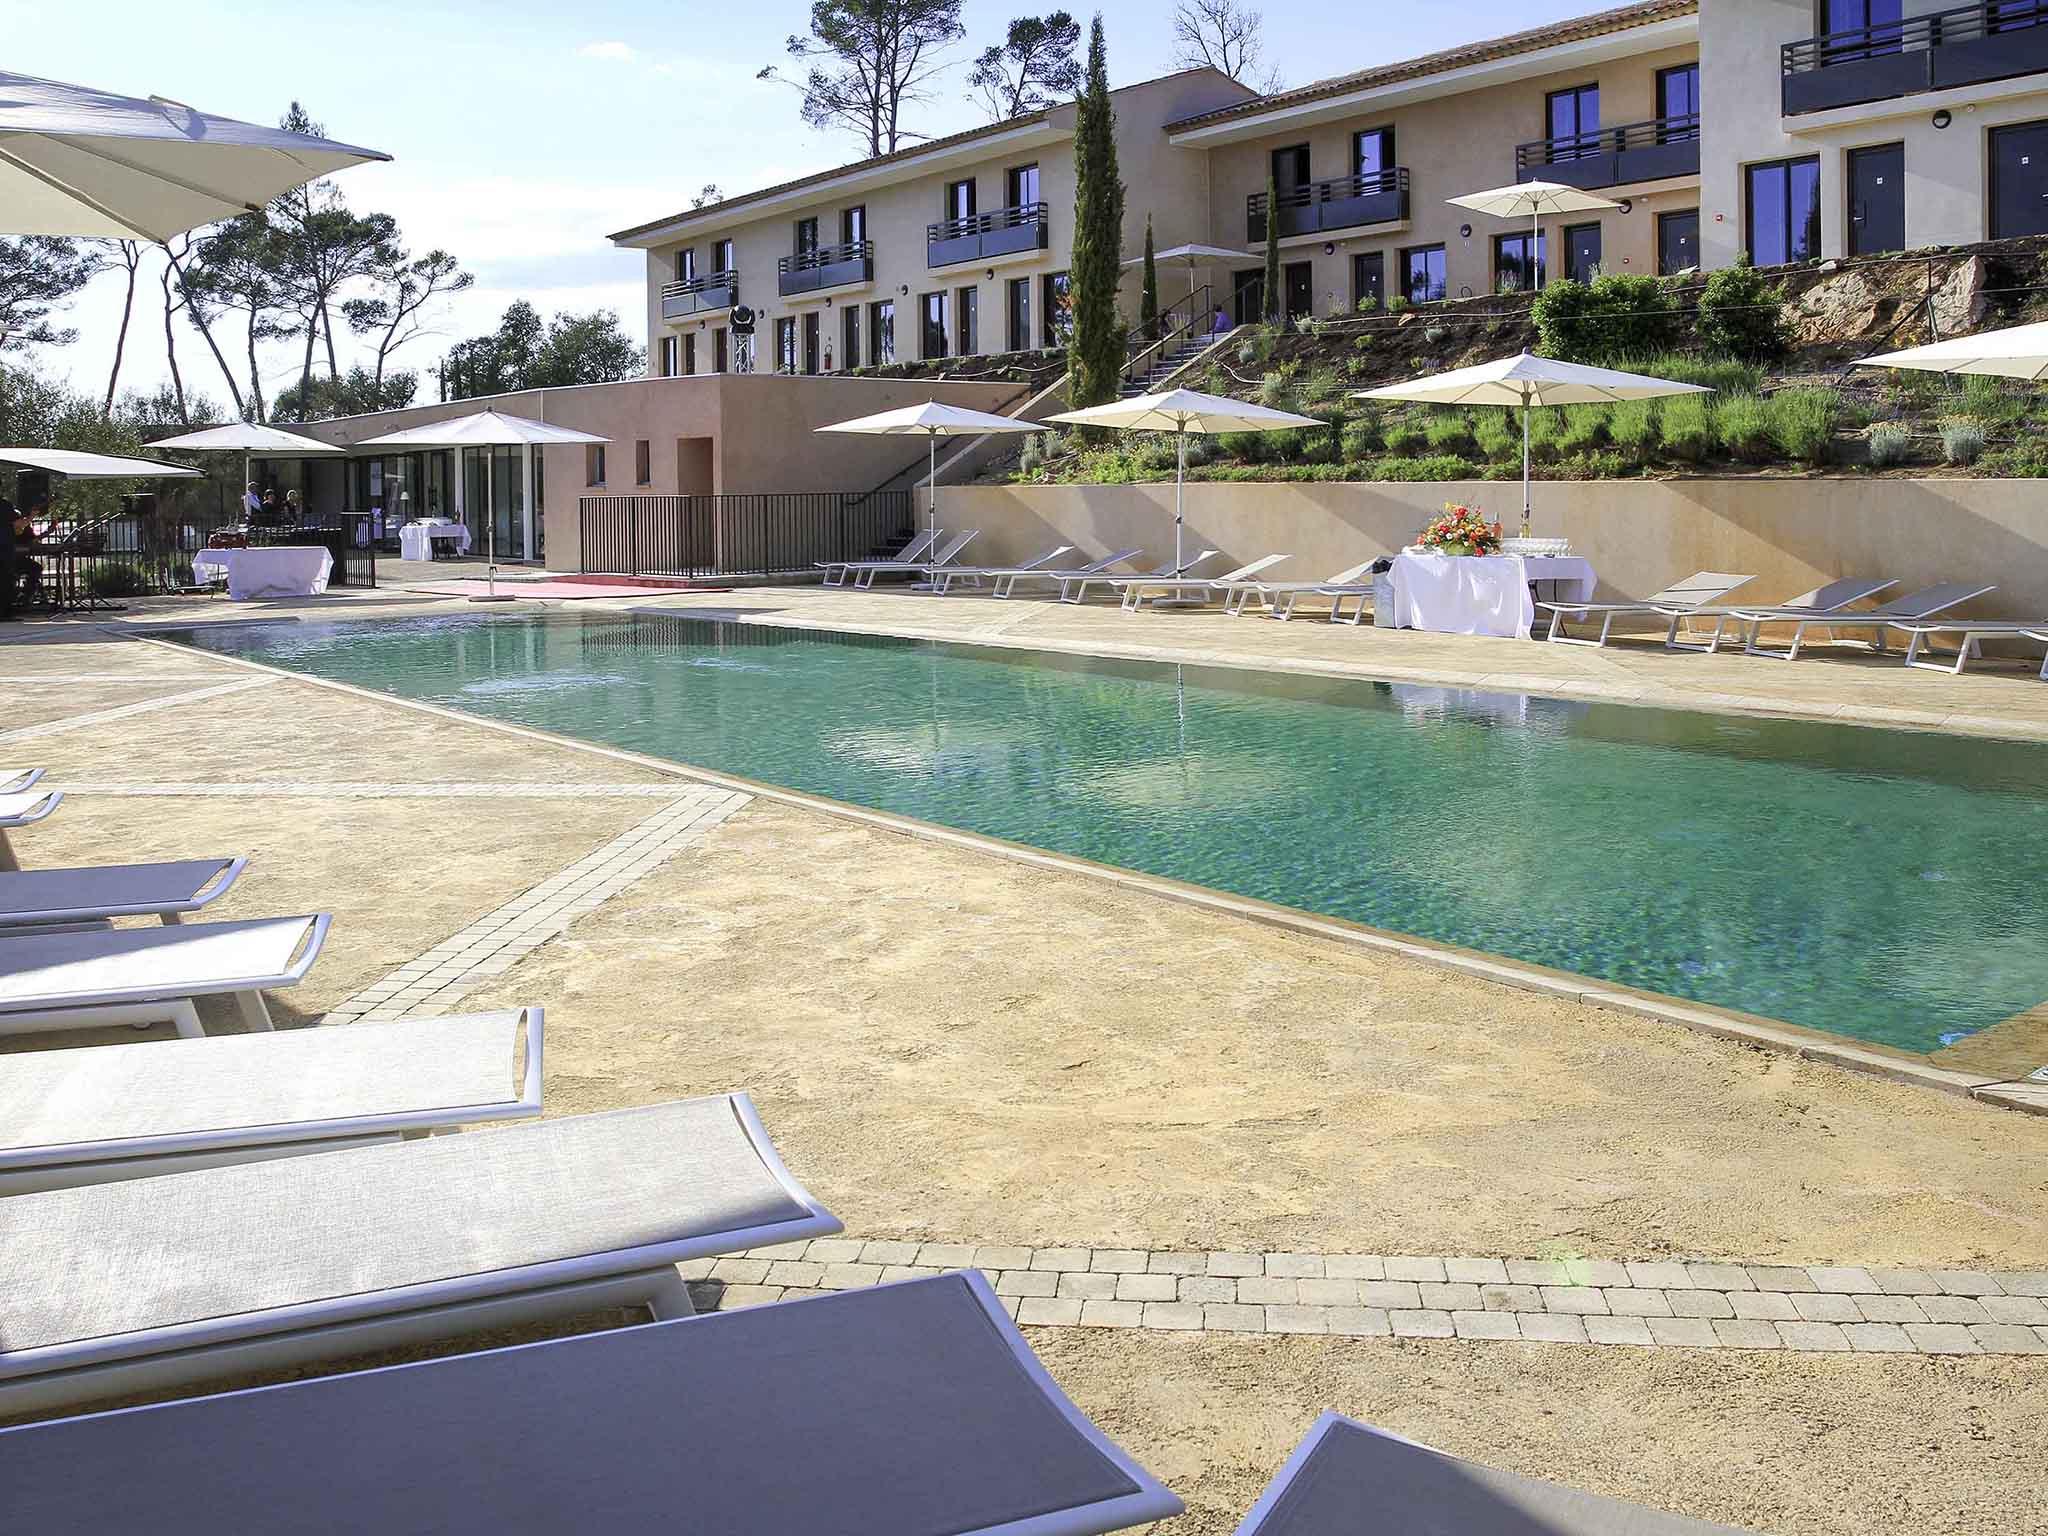 Отель — Hôtel Mercure Brignoles Golf de Barbaroux